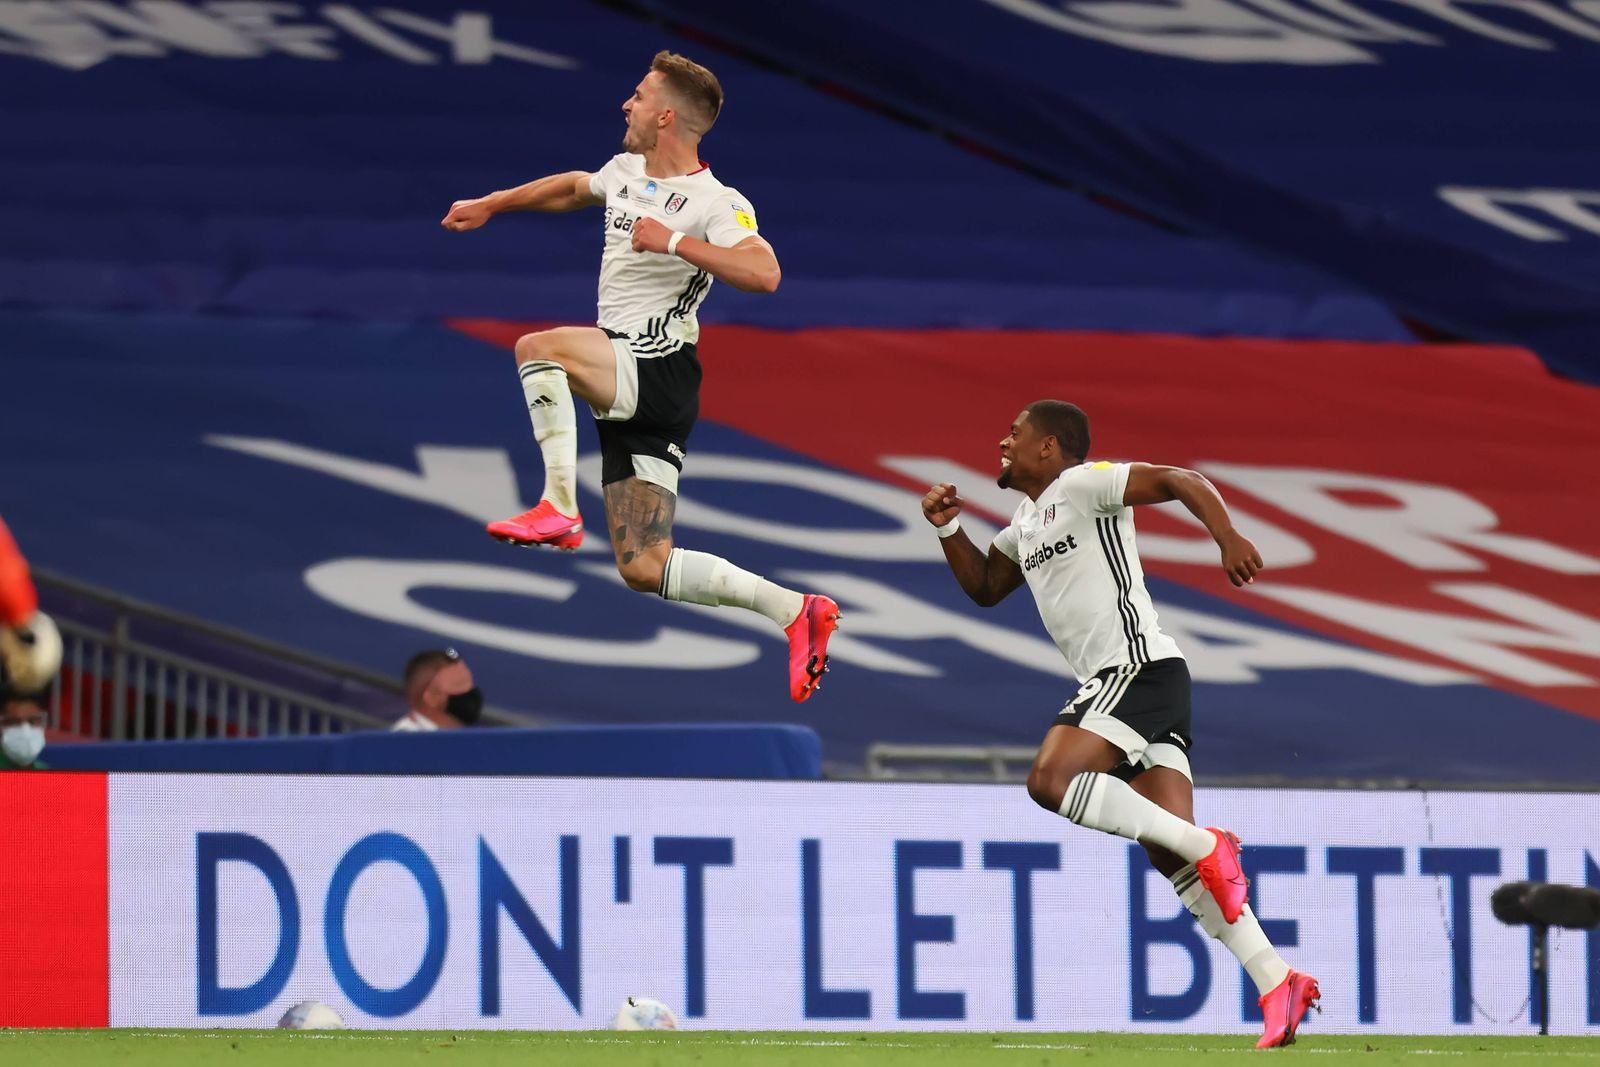 4th August 2020; Wembley Stadium, London, England; EFL Championship Playoff Football Final, Brentford versus Fulham; Jo